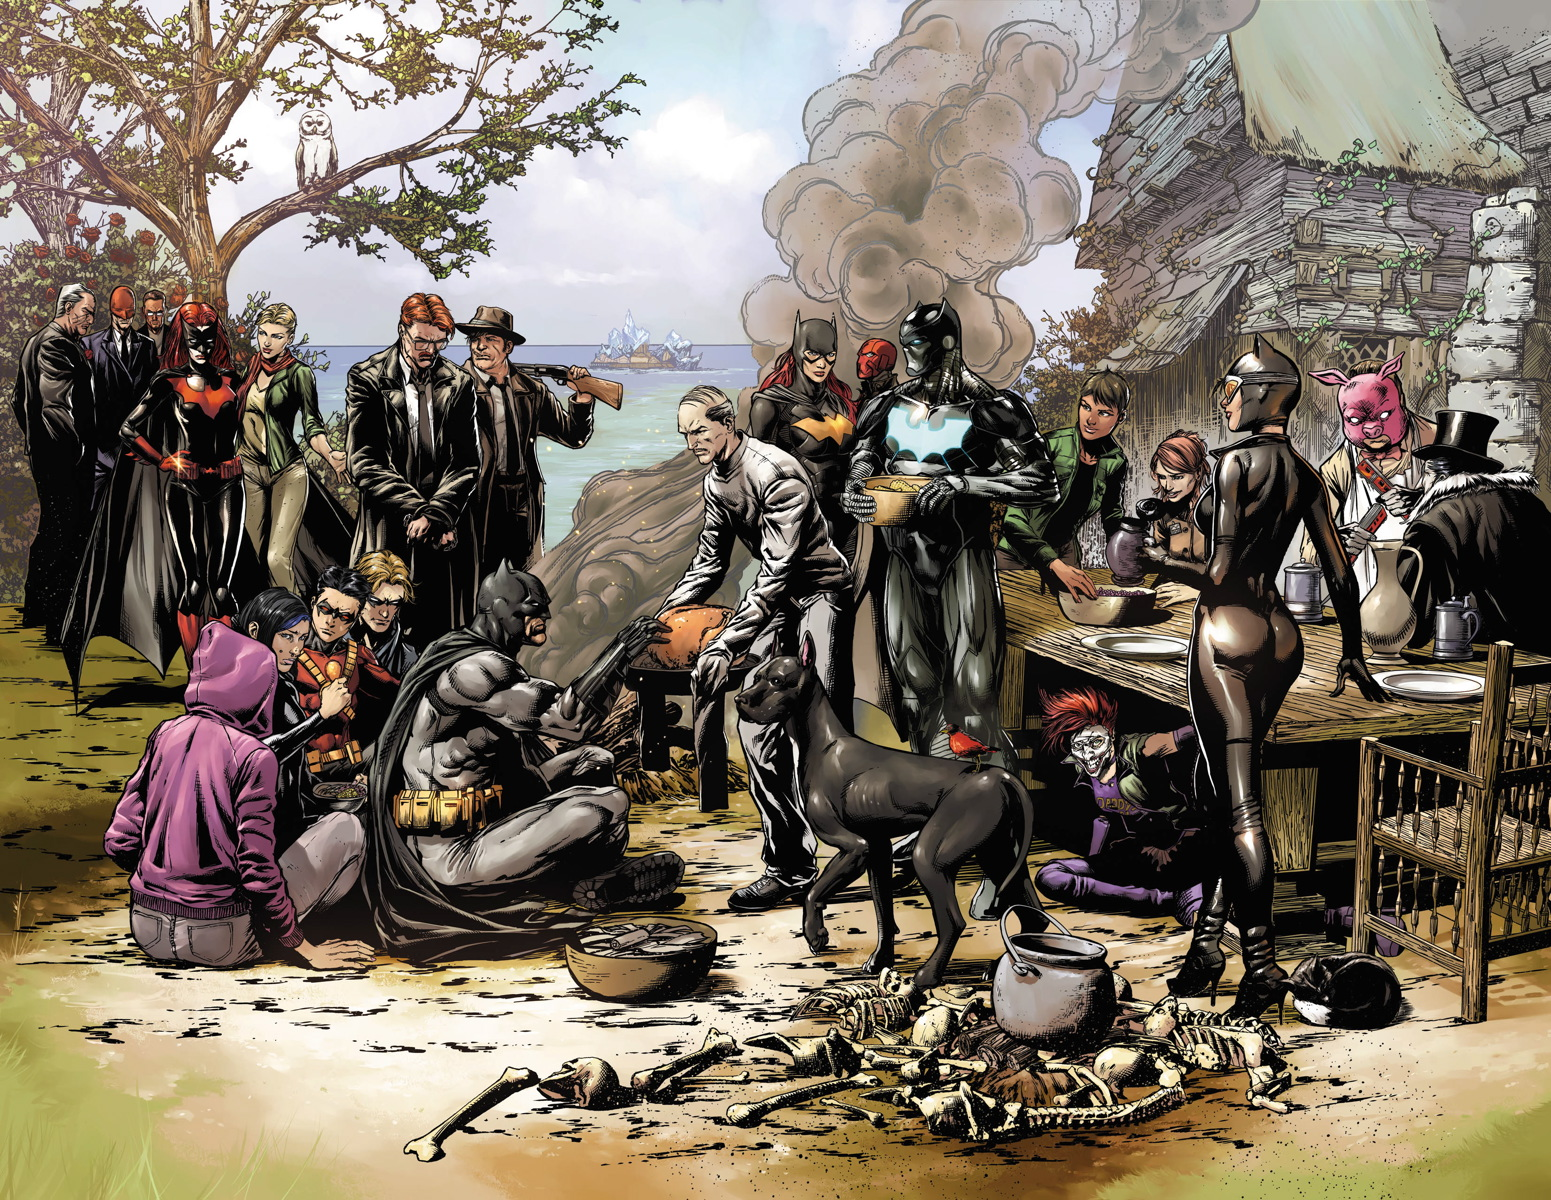 Batman Eterno, obra de Jason Fabrok, imitando un cuadro clásico